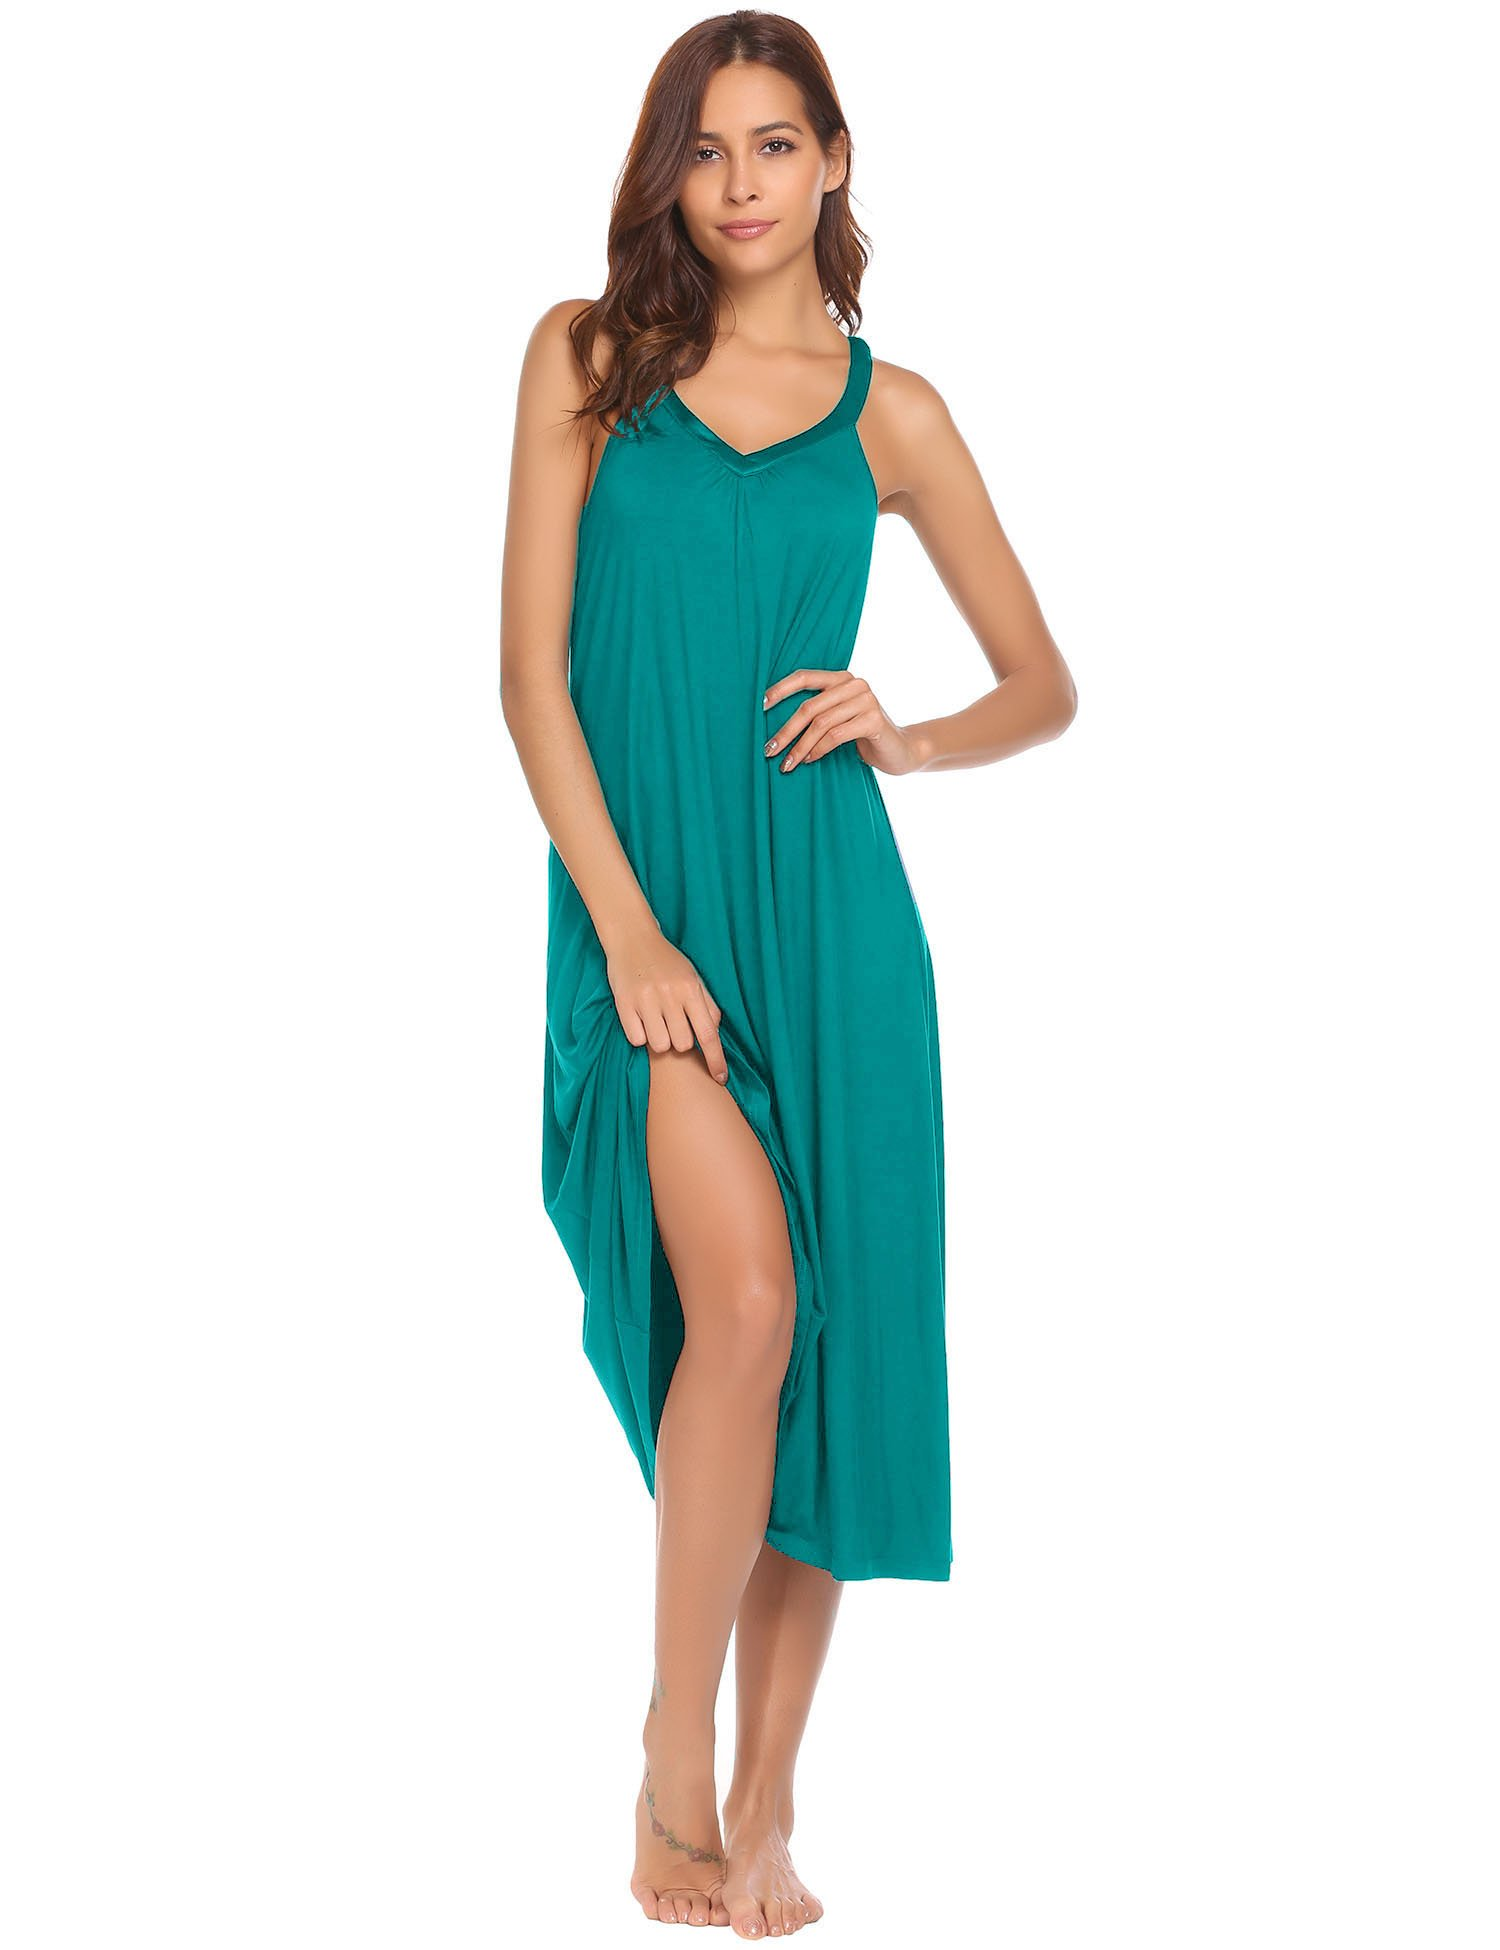 Ekouaer Long Nightgown Women's Solid Sleeveless Nightshirts Sleepwear, 8358-peacock Blue, Small